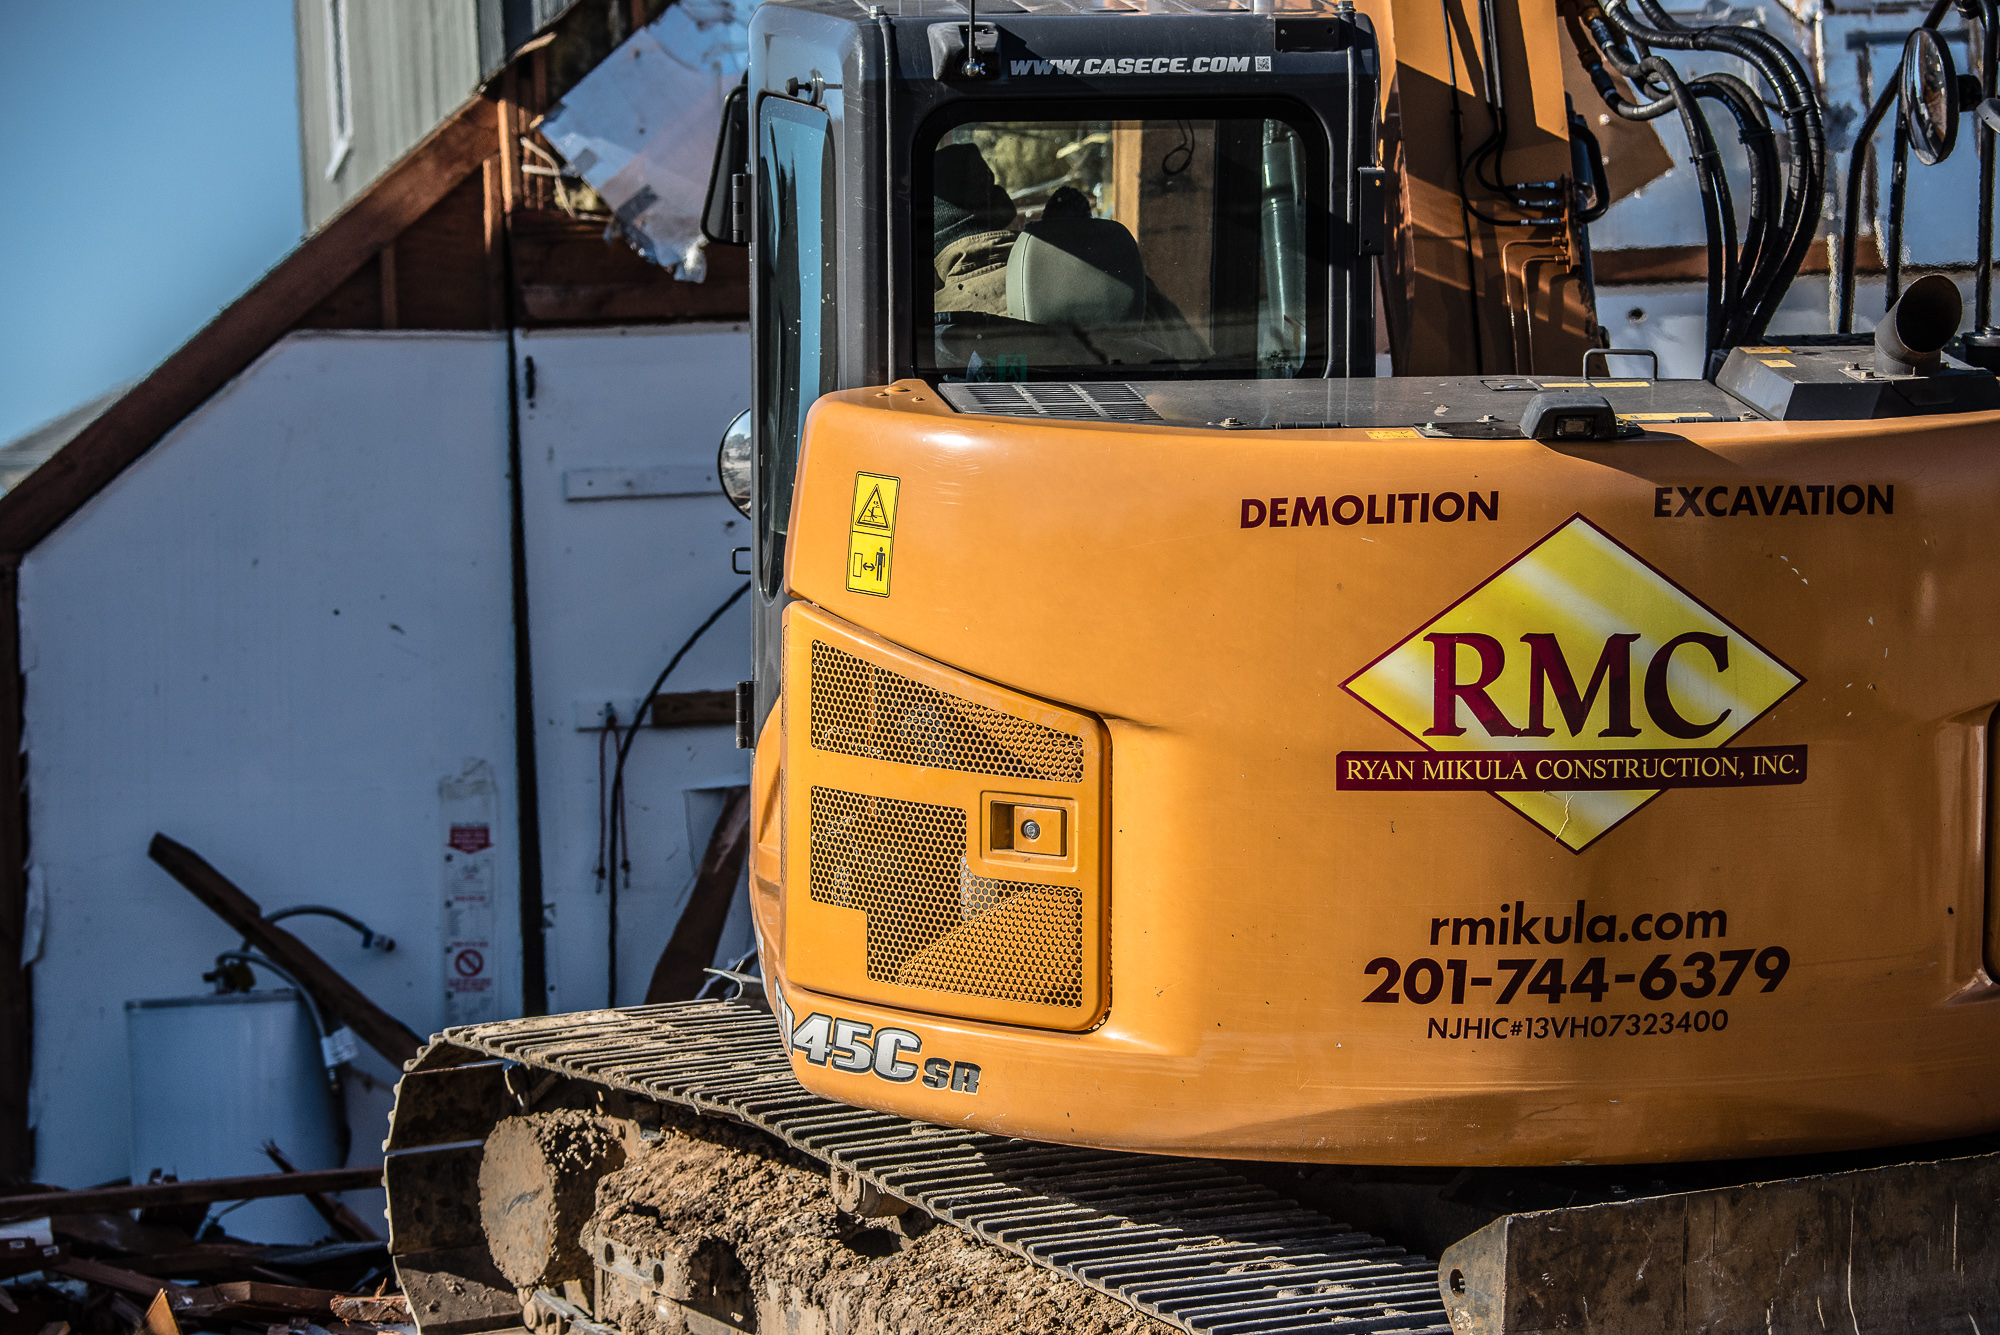 New Jersey demolition business; website photos; Landmark Image Group, David Lau